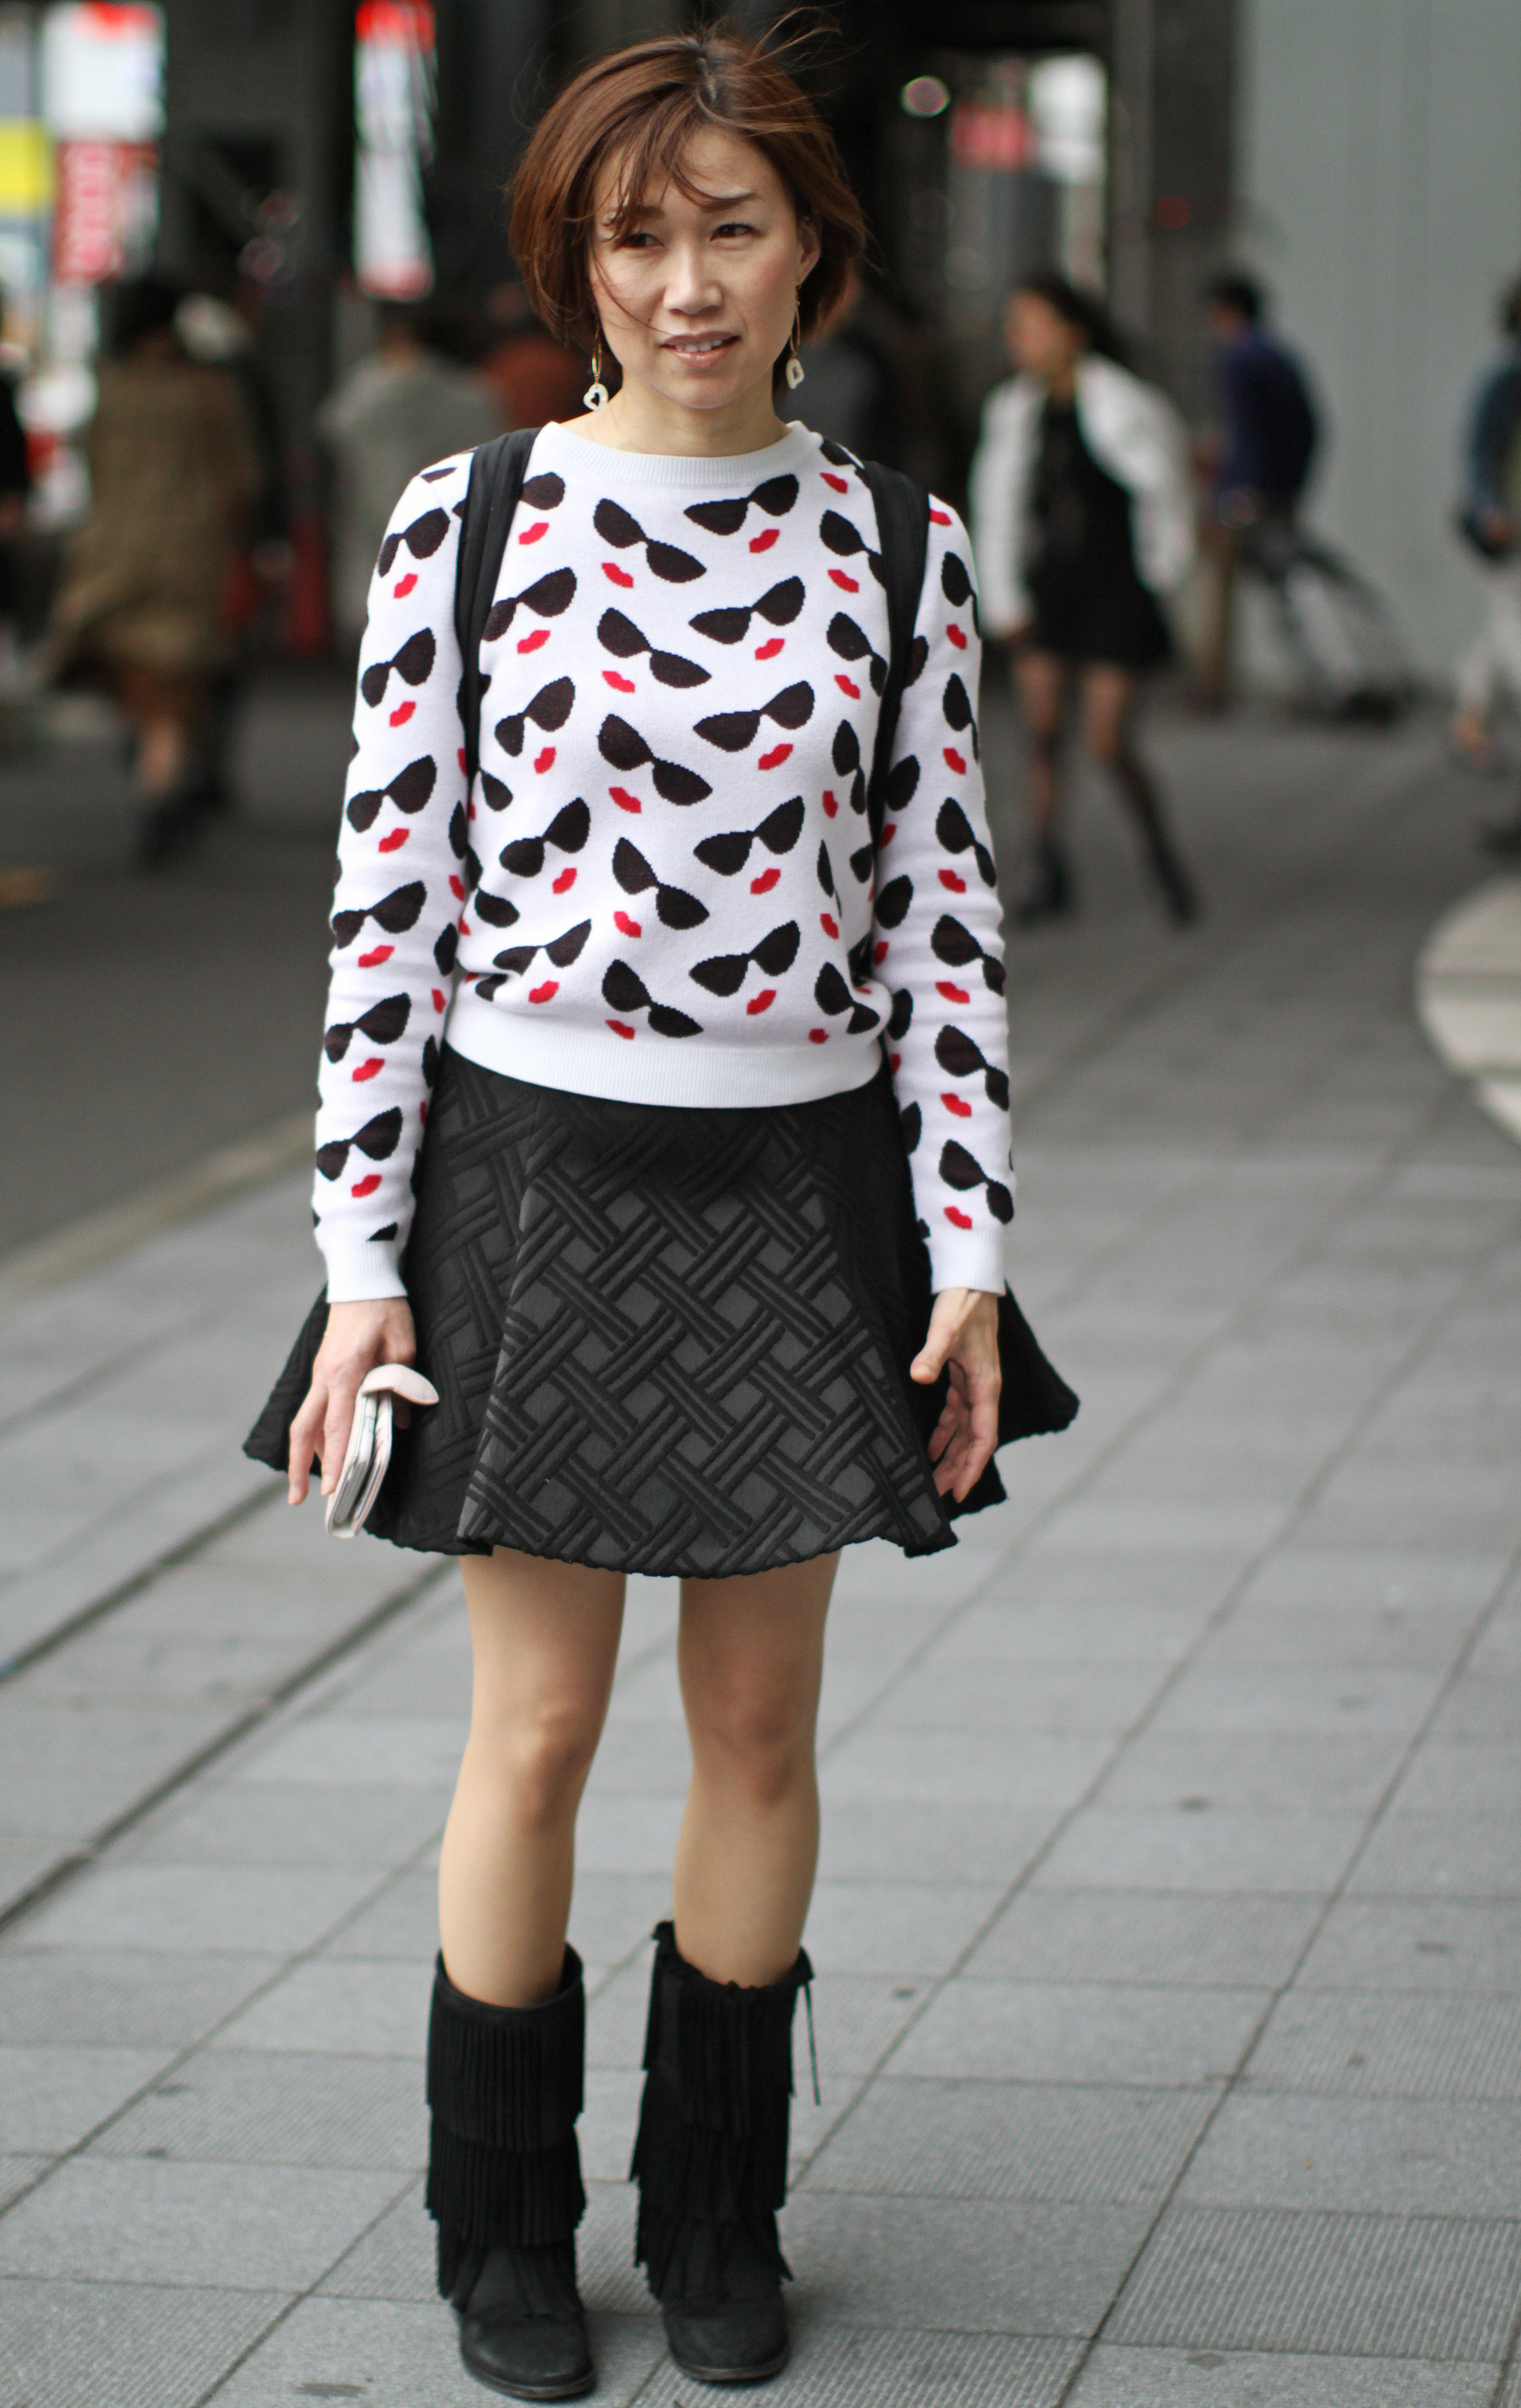 14 H Ftiga Streetstyle Outfits Fr N Tokyo Fashion Week 2016 Metro Mode